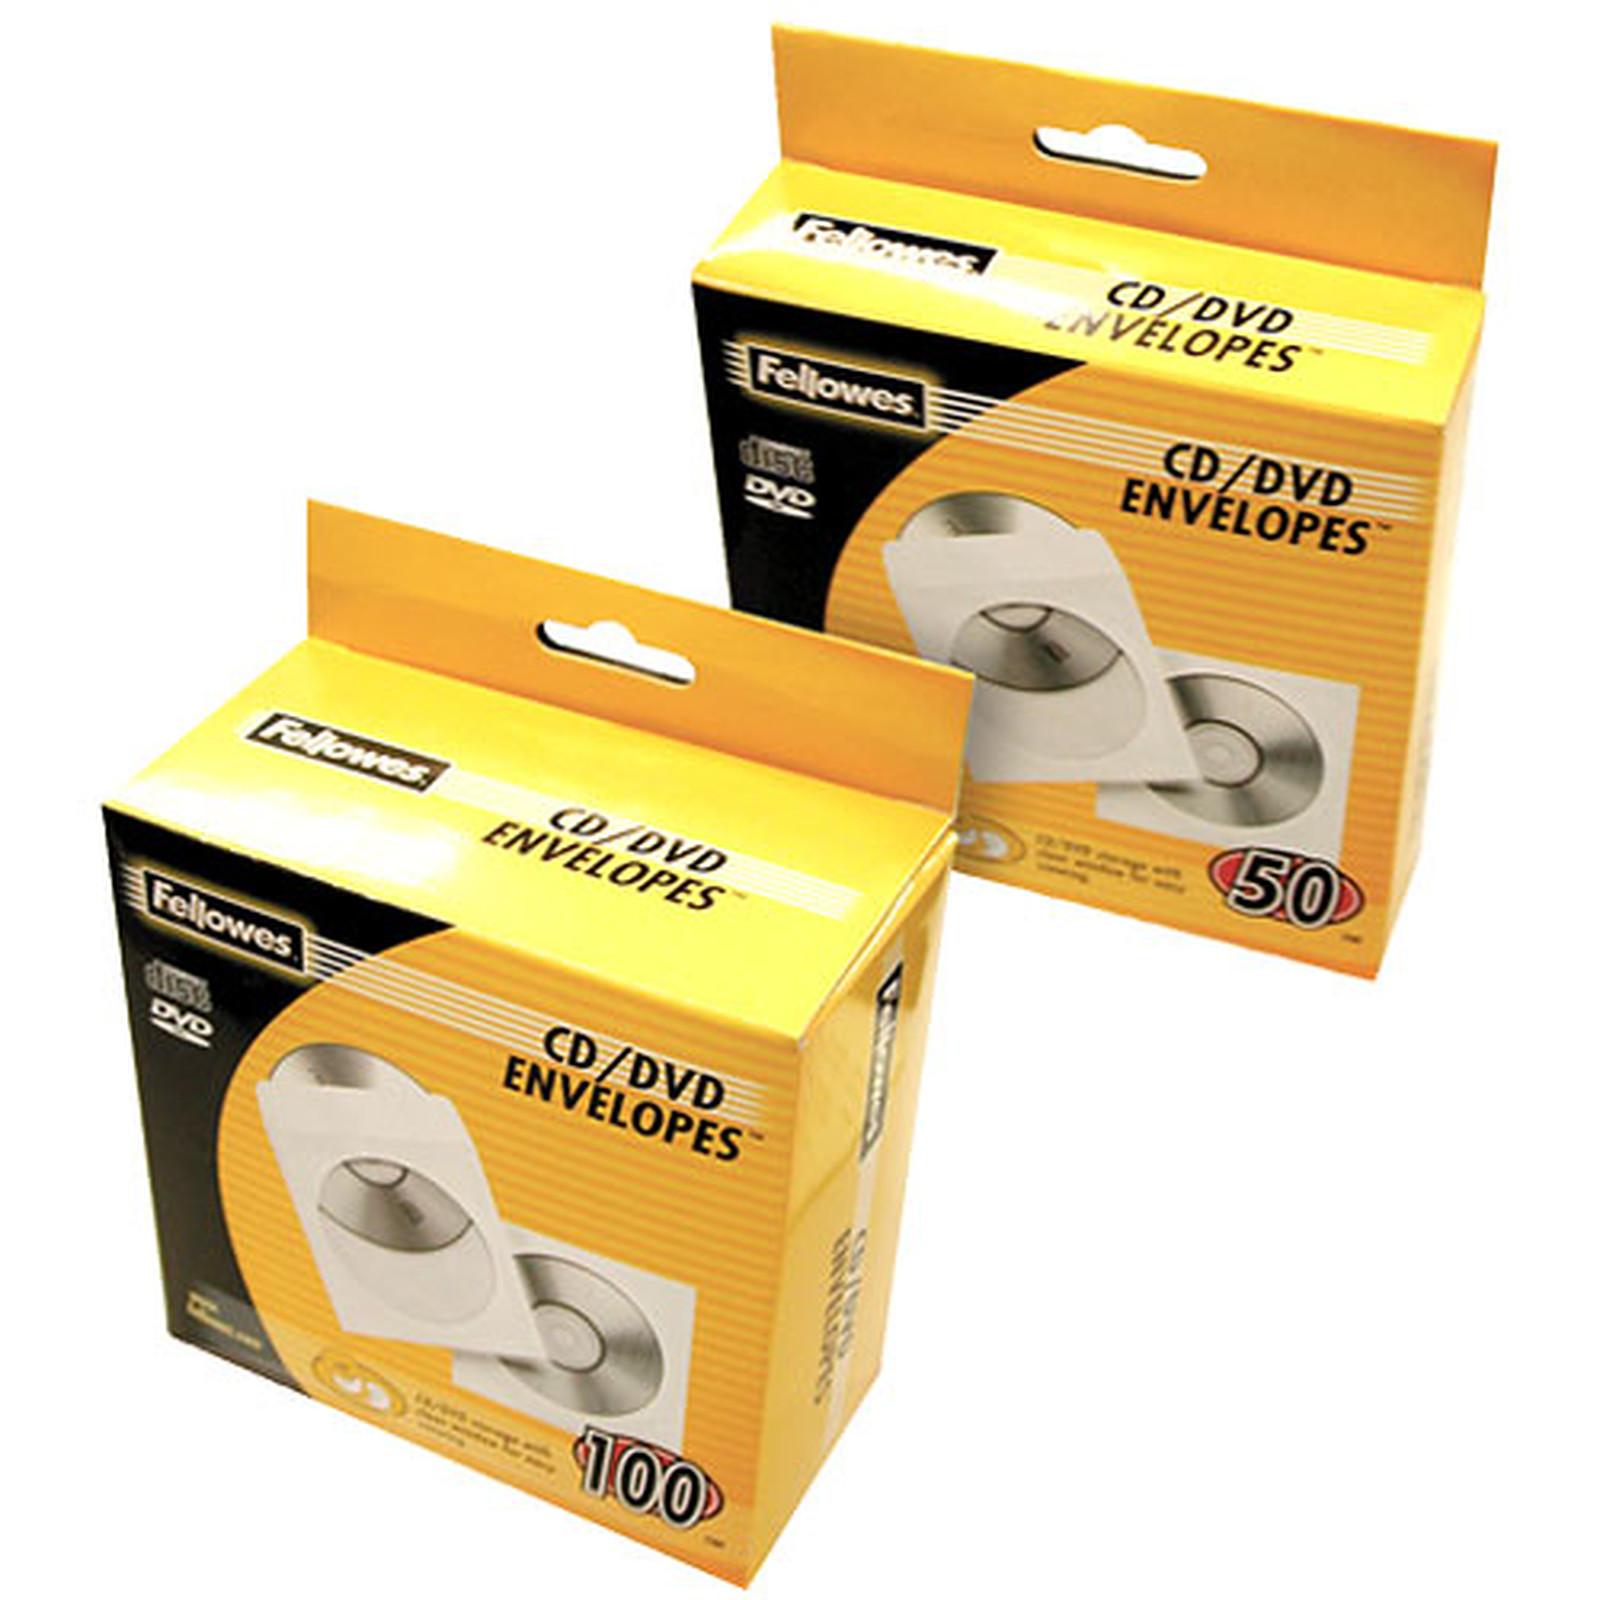 Fellowes 100 sobres de papel para CD/DVD